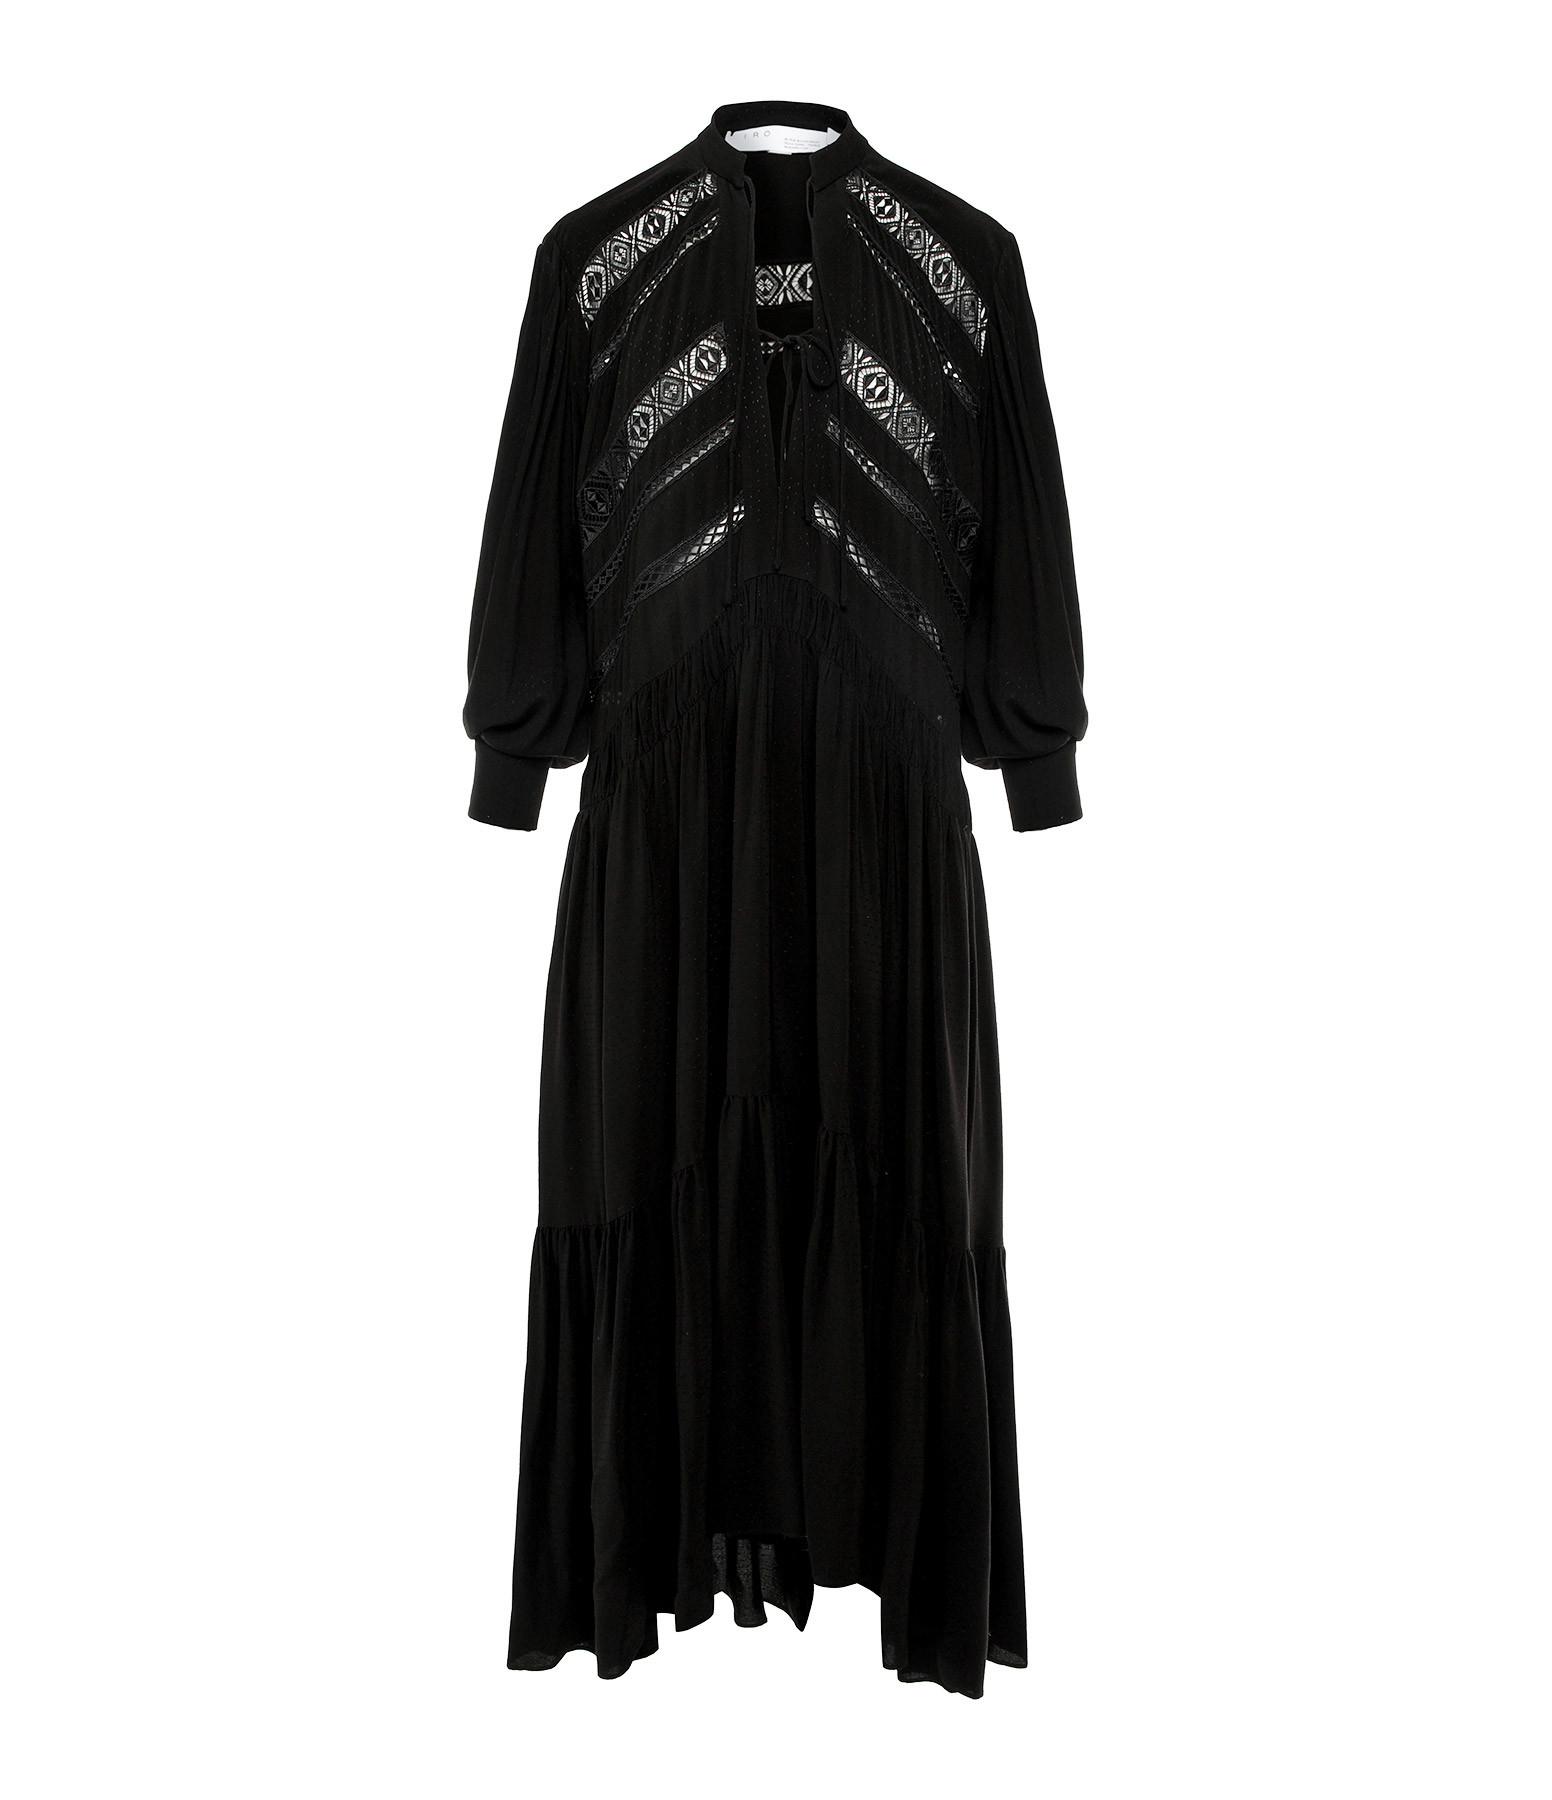 IRO - Robe Padding Noir